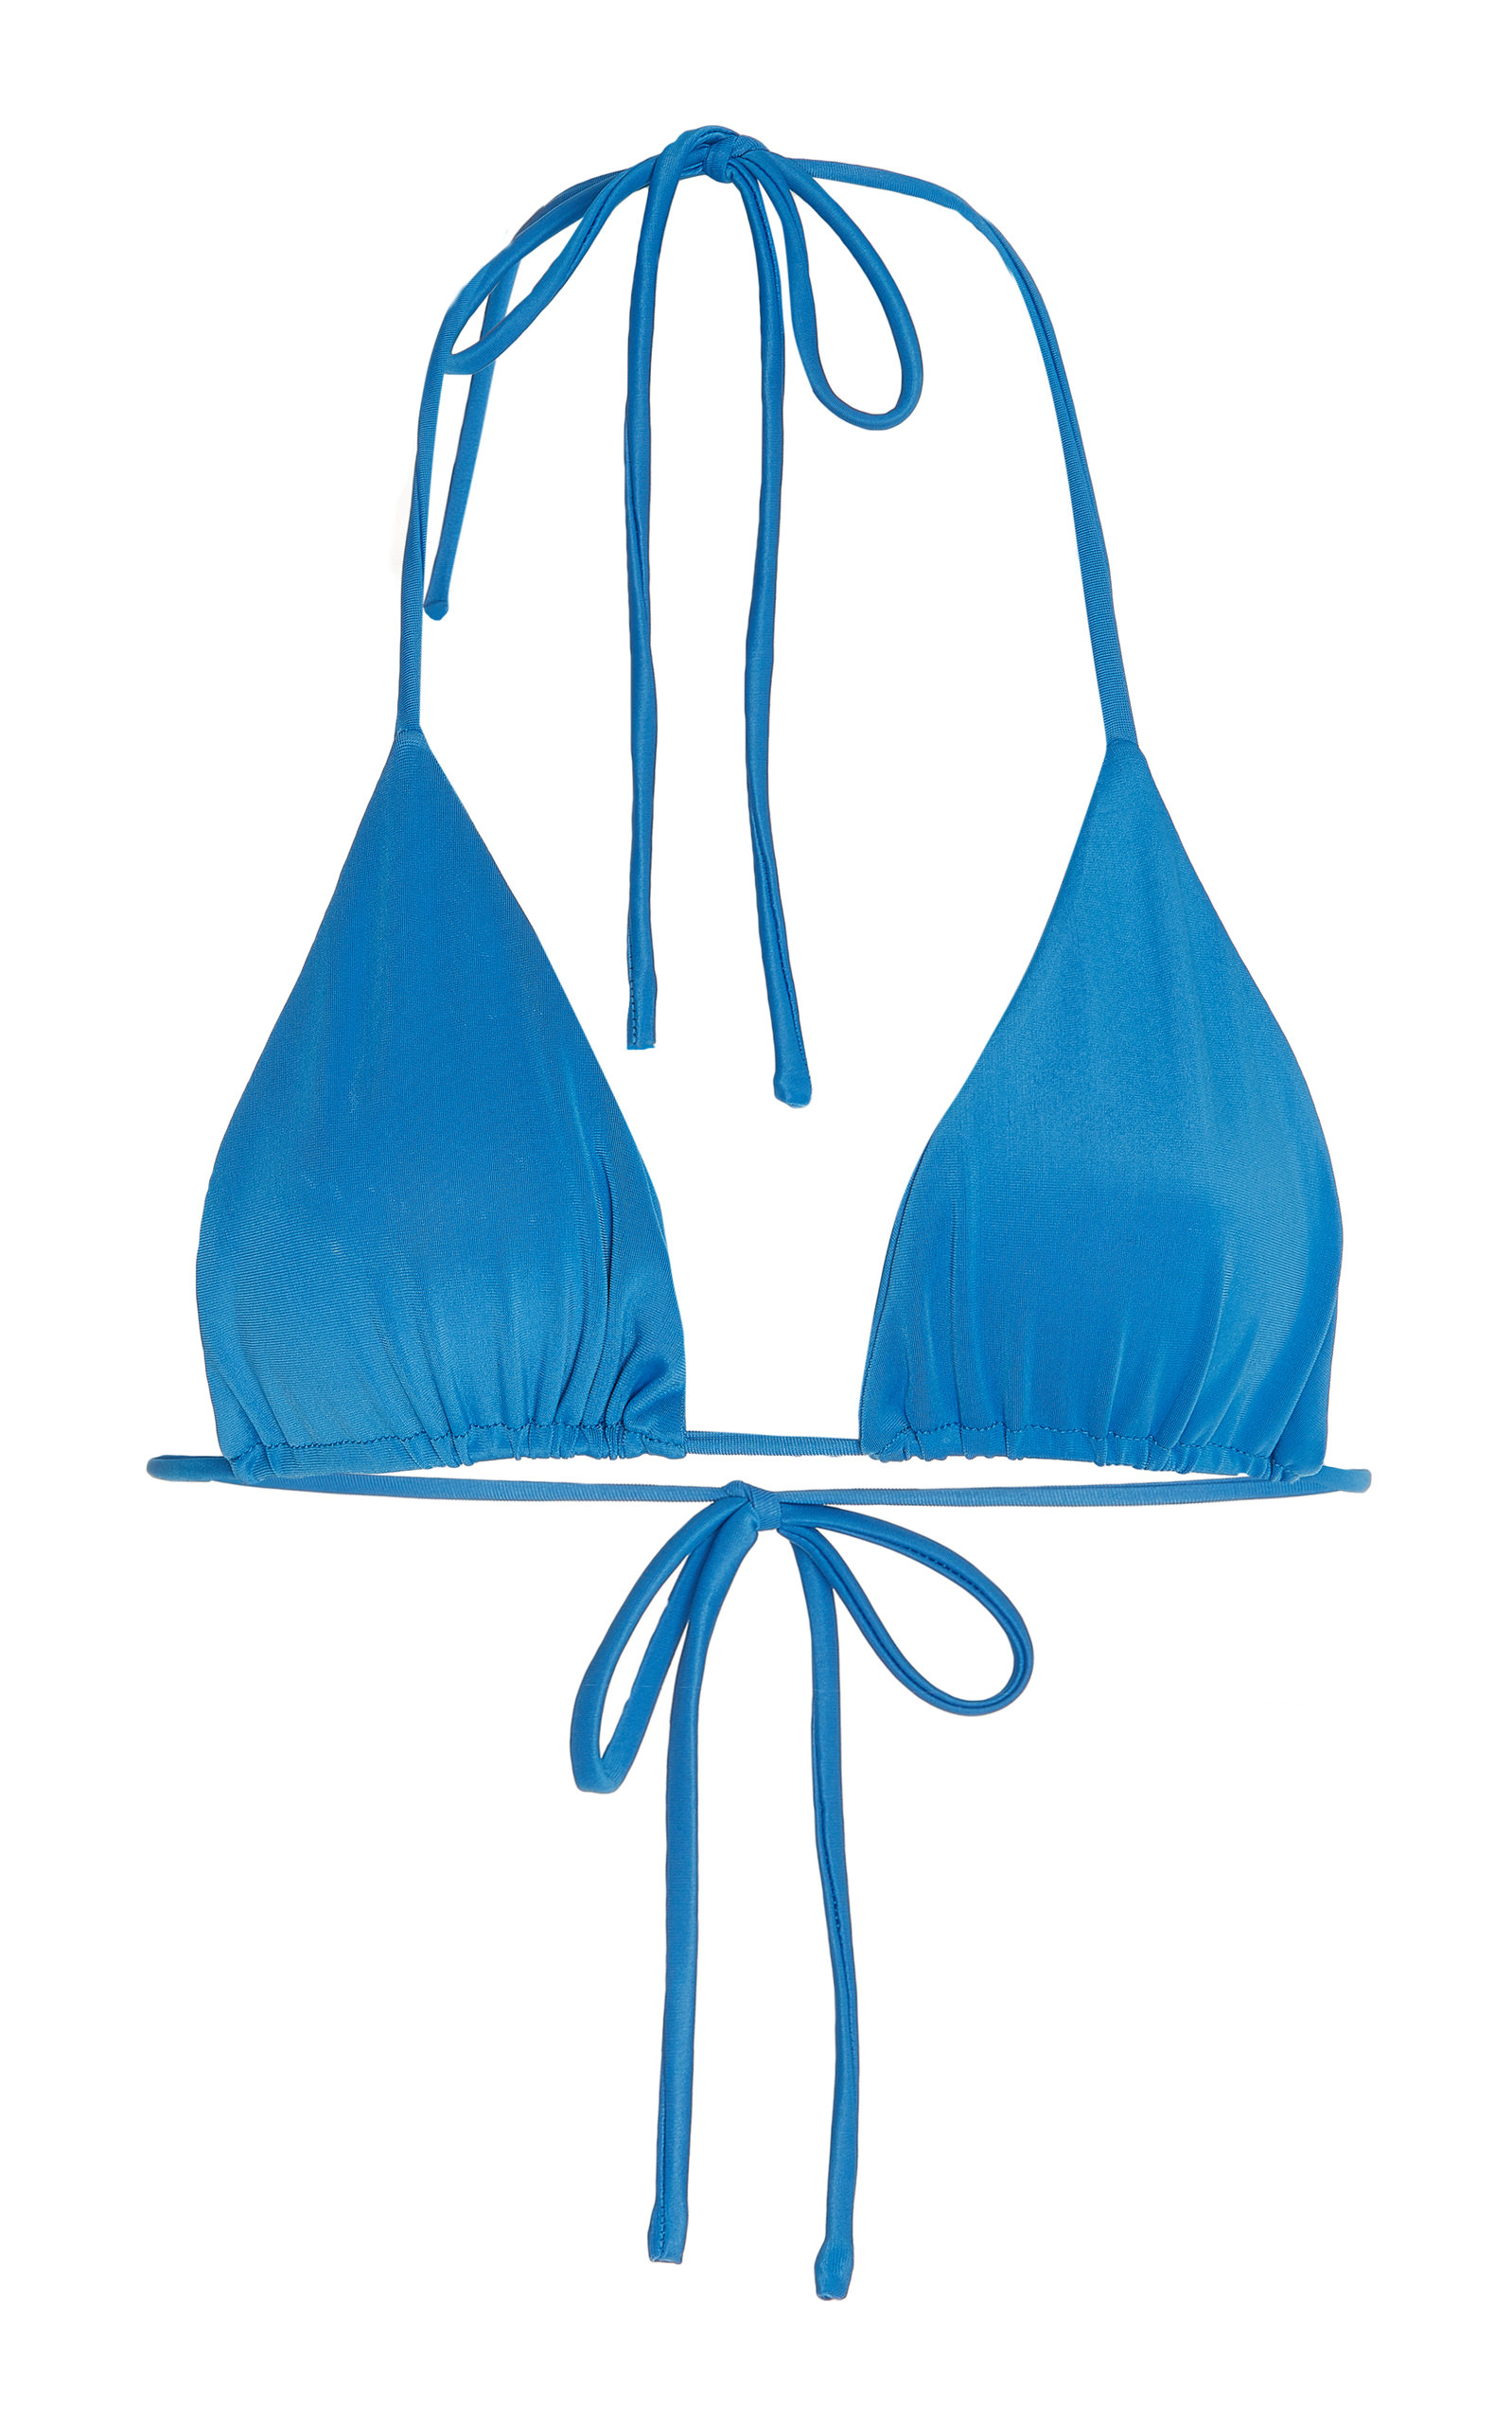 Aexae - Women's Tyra Bikini Top - Blue/brown - Moda Operandi